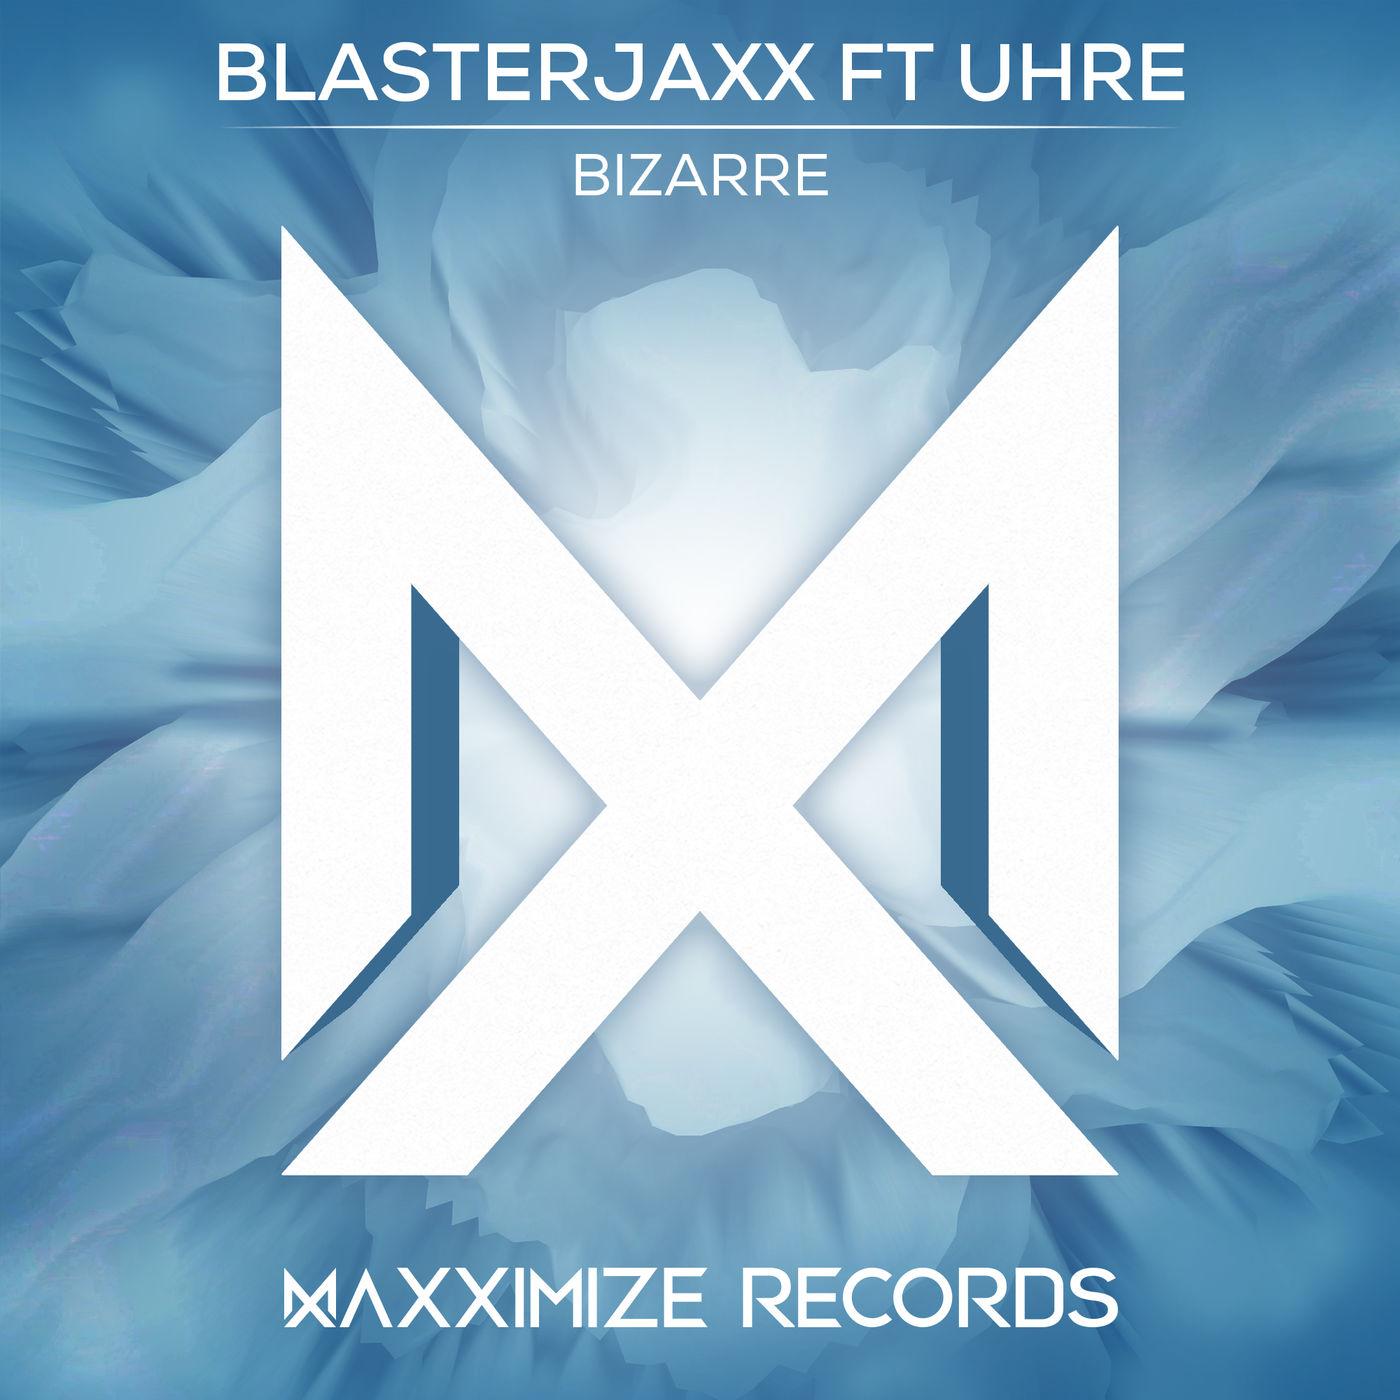 BlasterJaxx - Bizarre (feat. UHRE) - Single